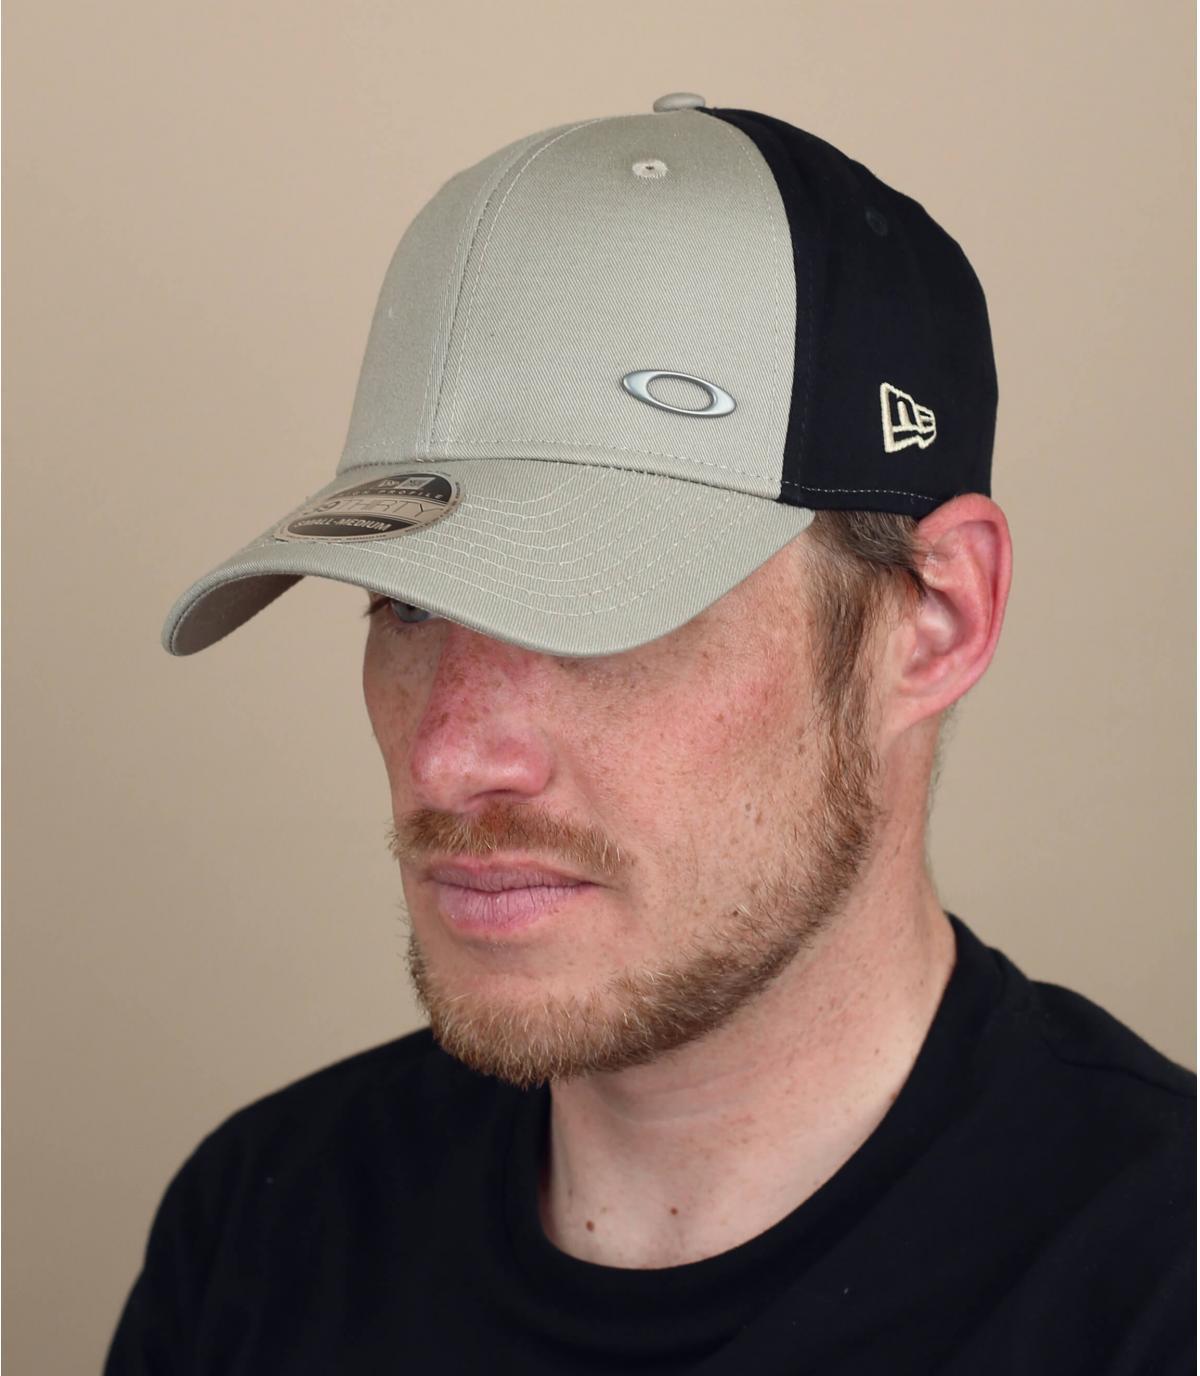 Beige Oakley curved cap